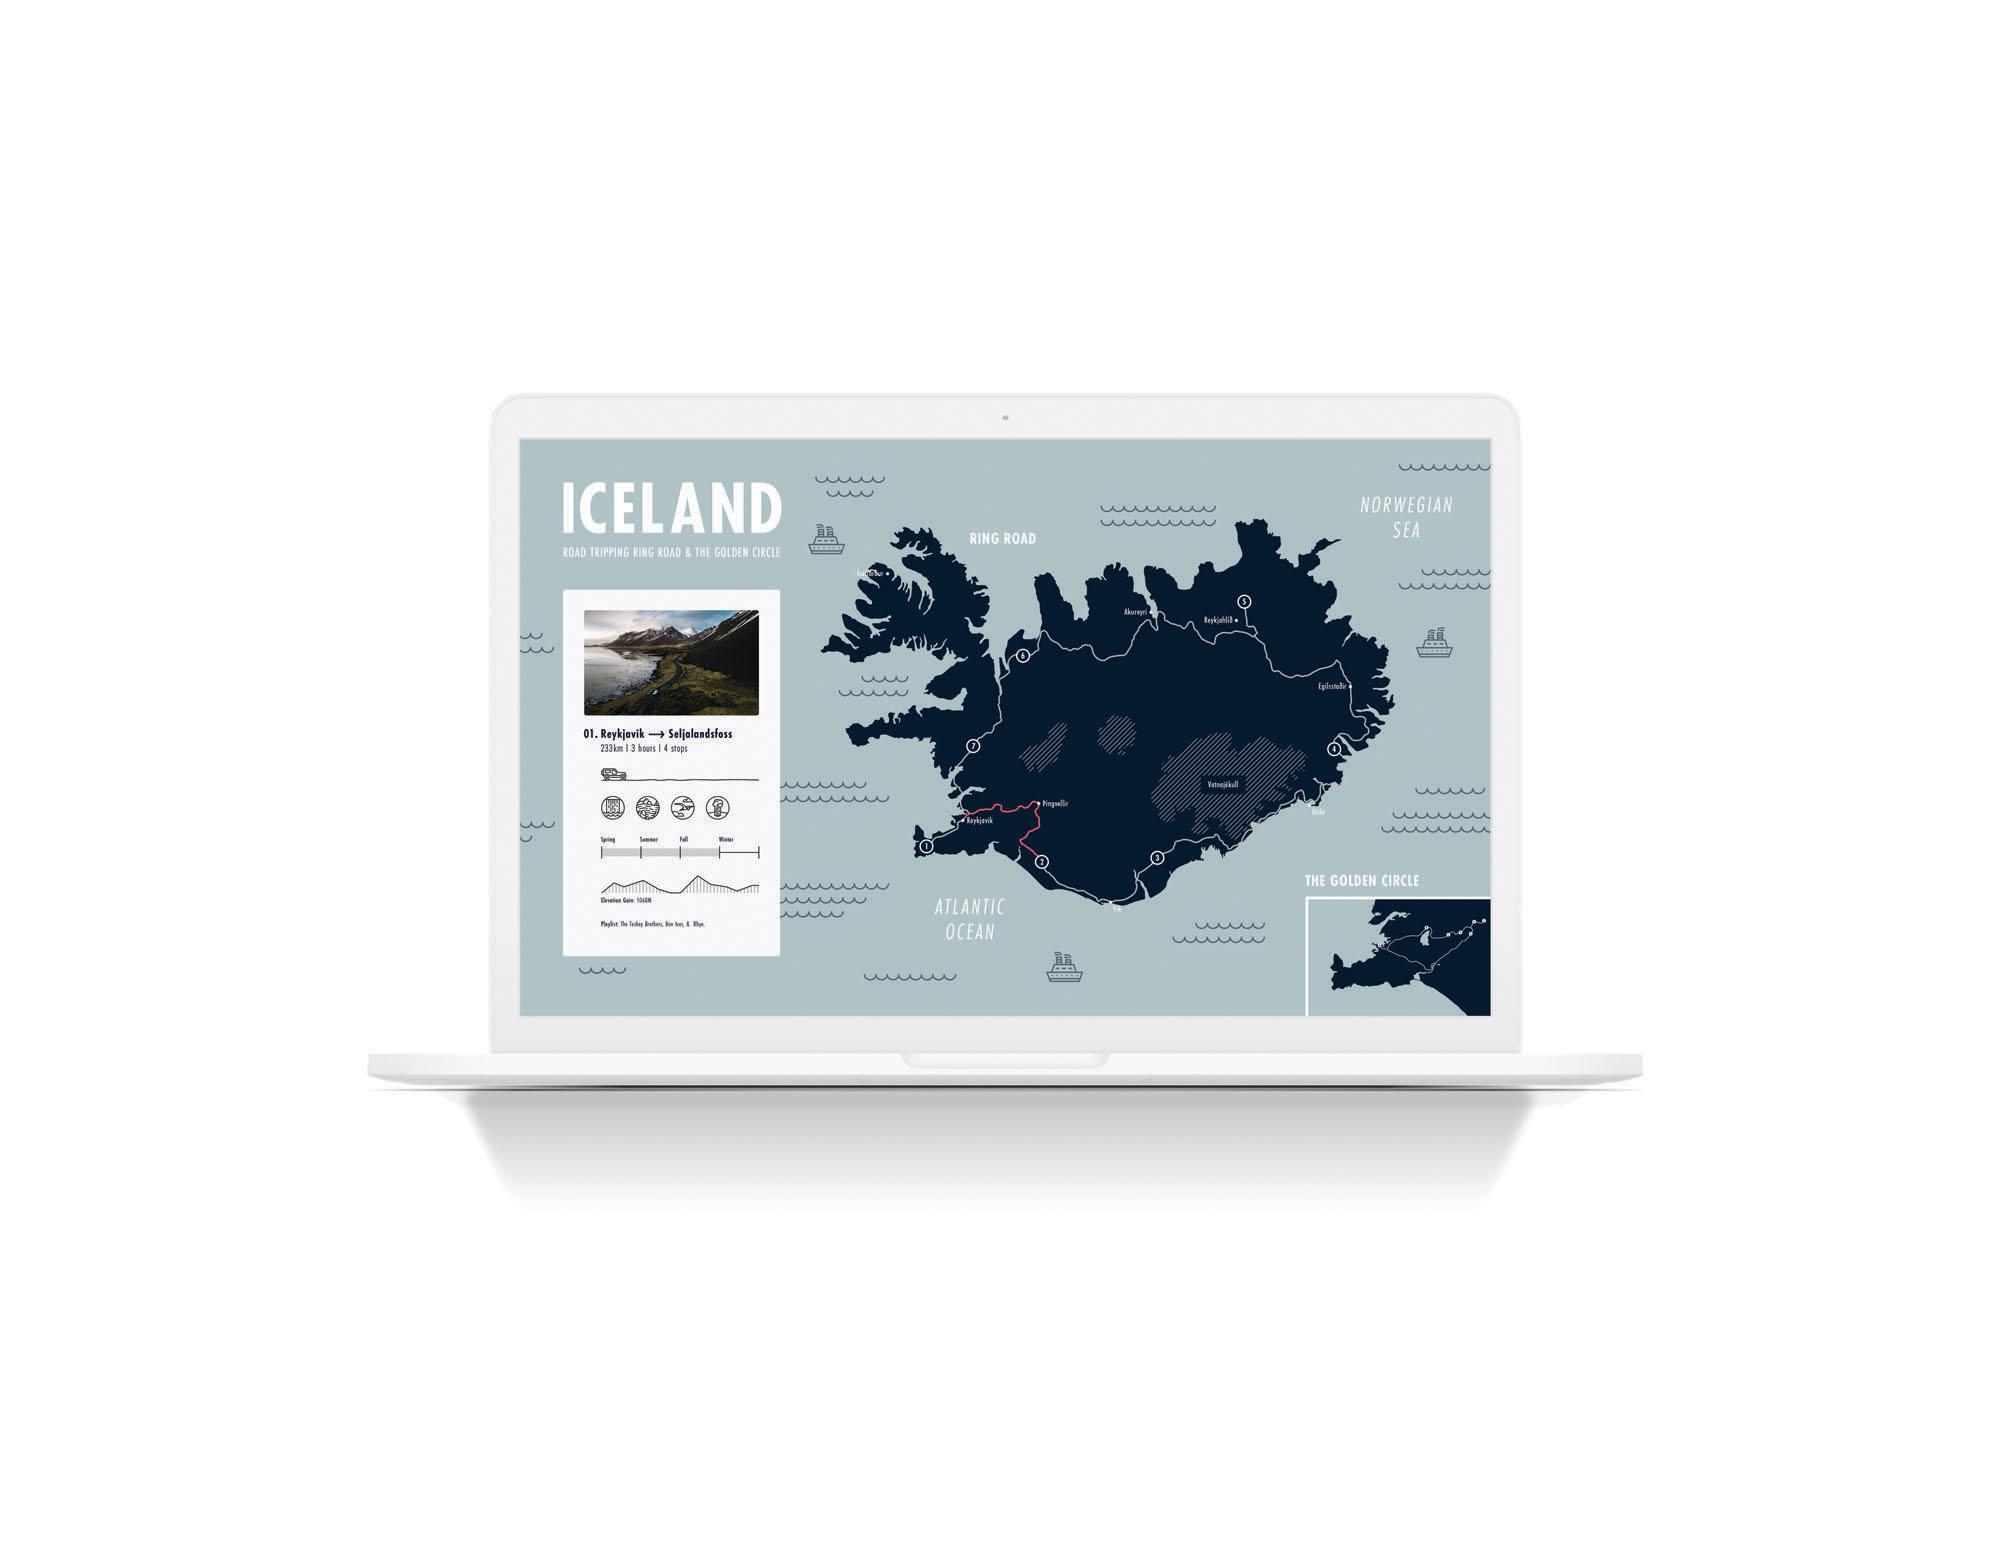 Heinricks Tess-Iceland Road Trip-1 - Tess Heinricks.jpg